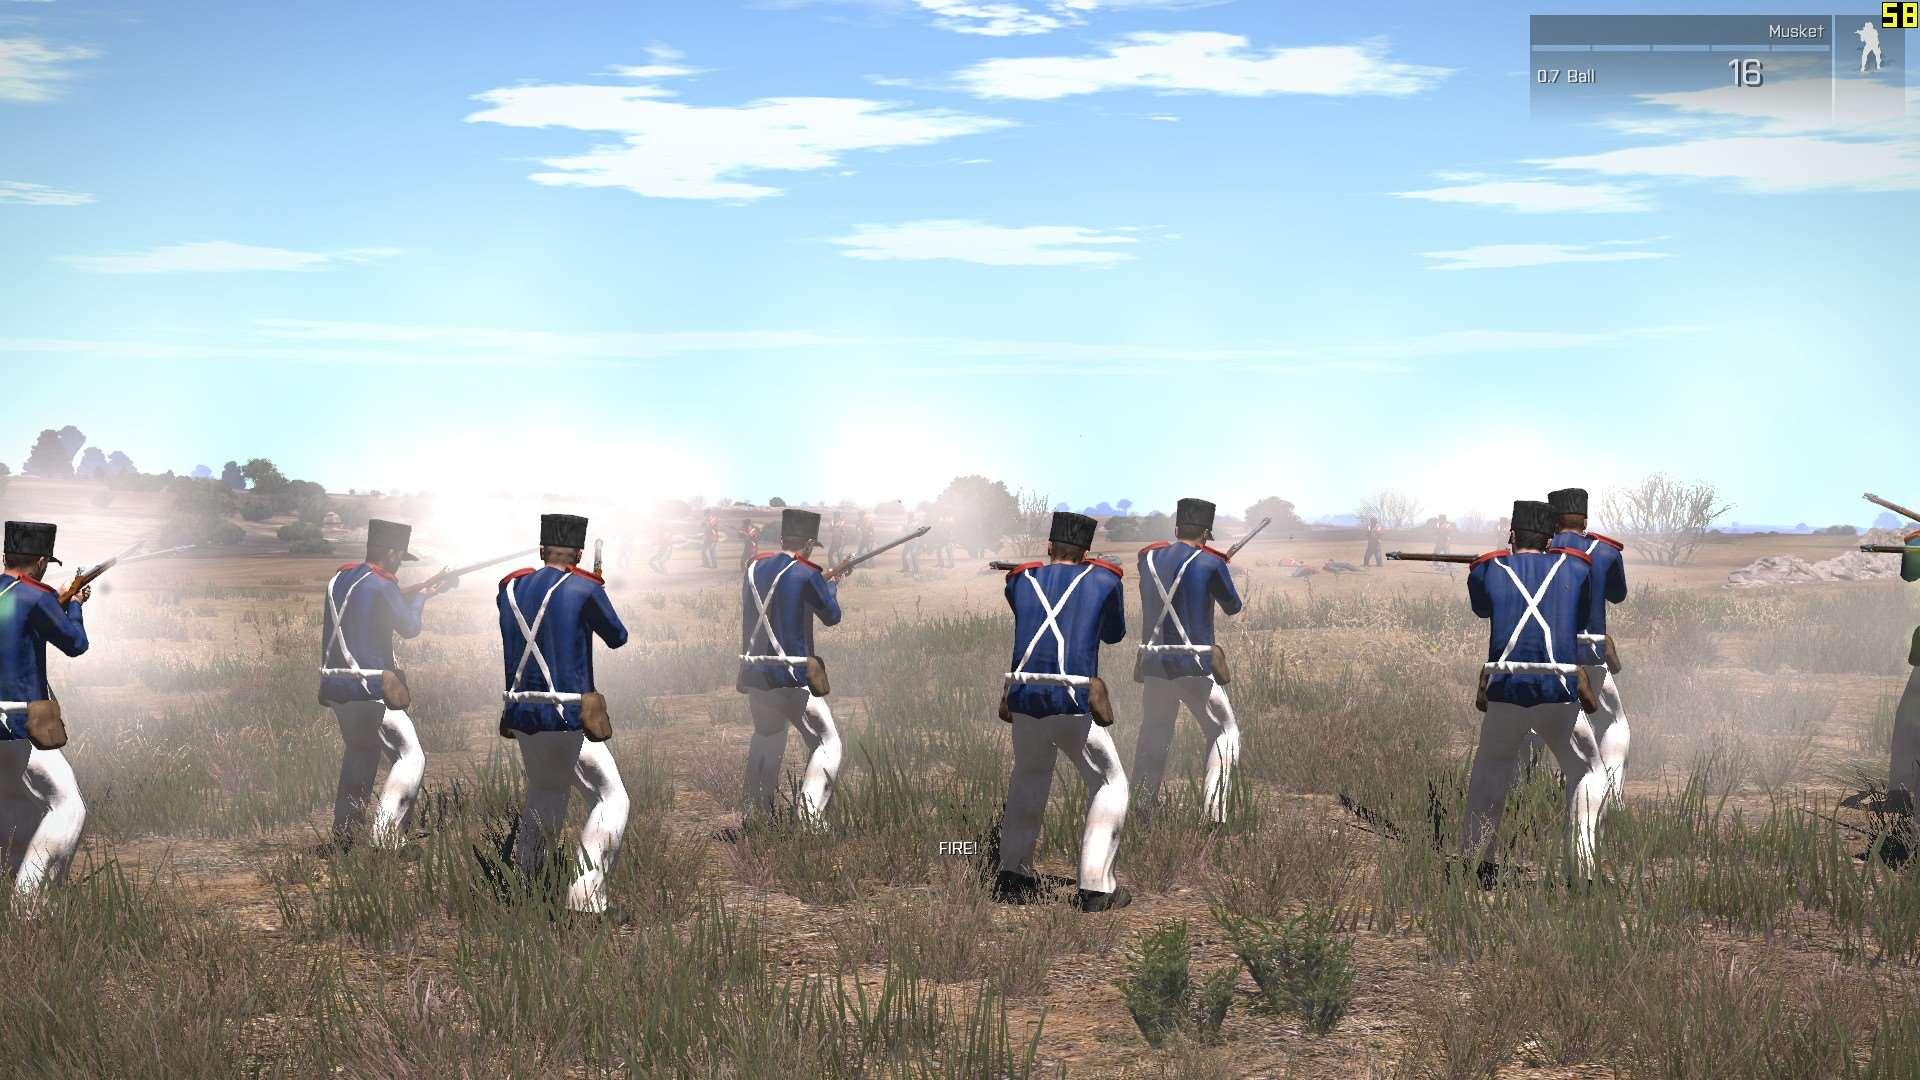 napoleonic-wars-01alpha-1_4